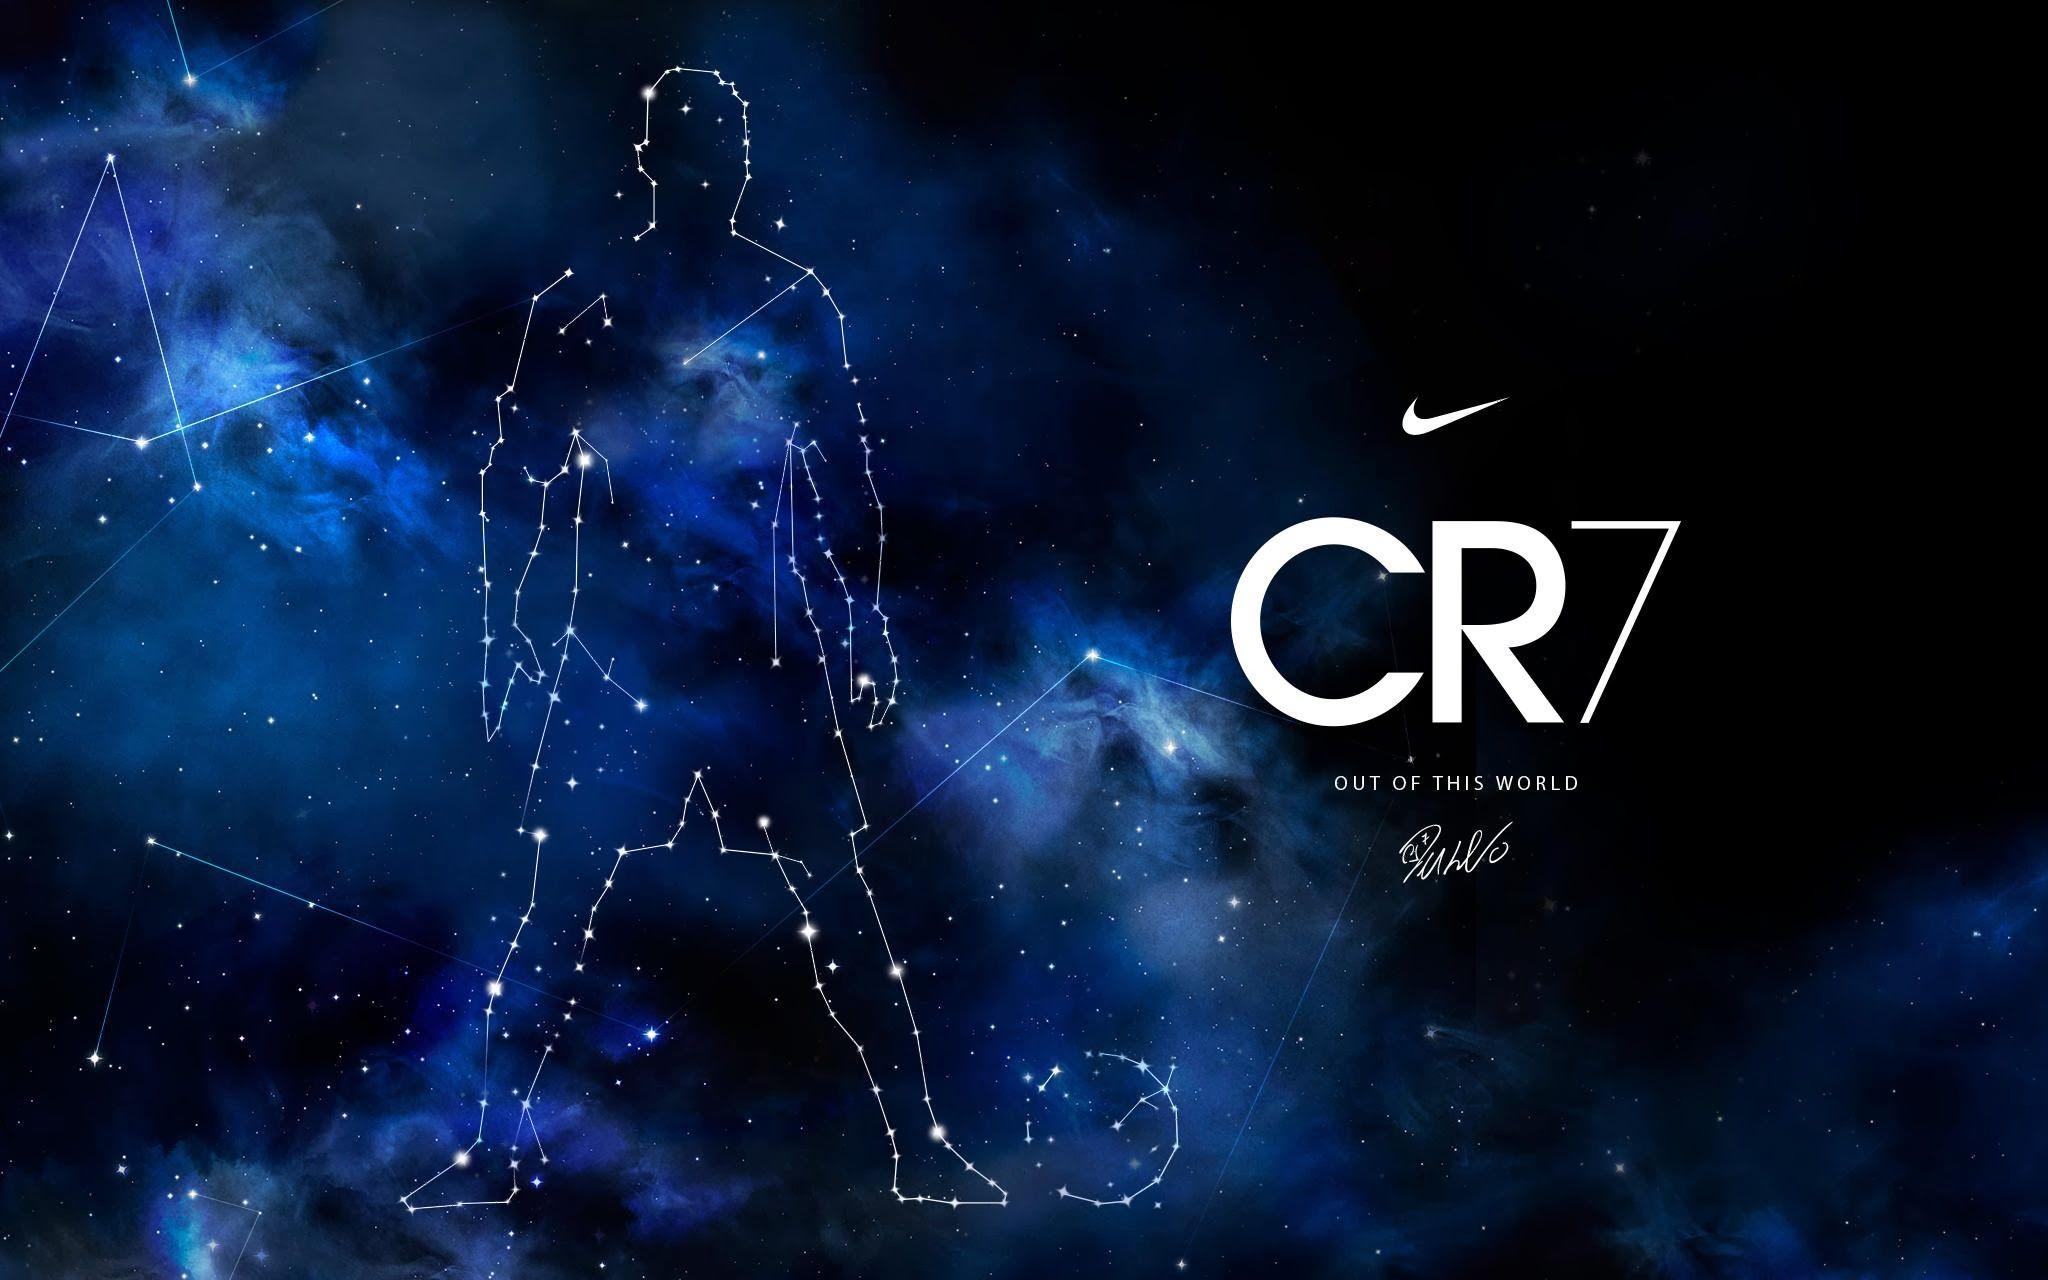 The Galaxy S4 Wallpaper I Just Pinned: Nike Wallpaper, Ronaldo